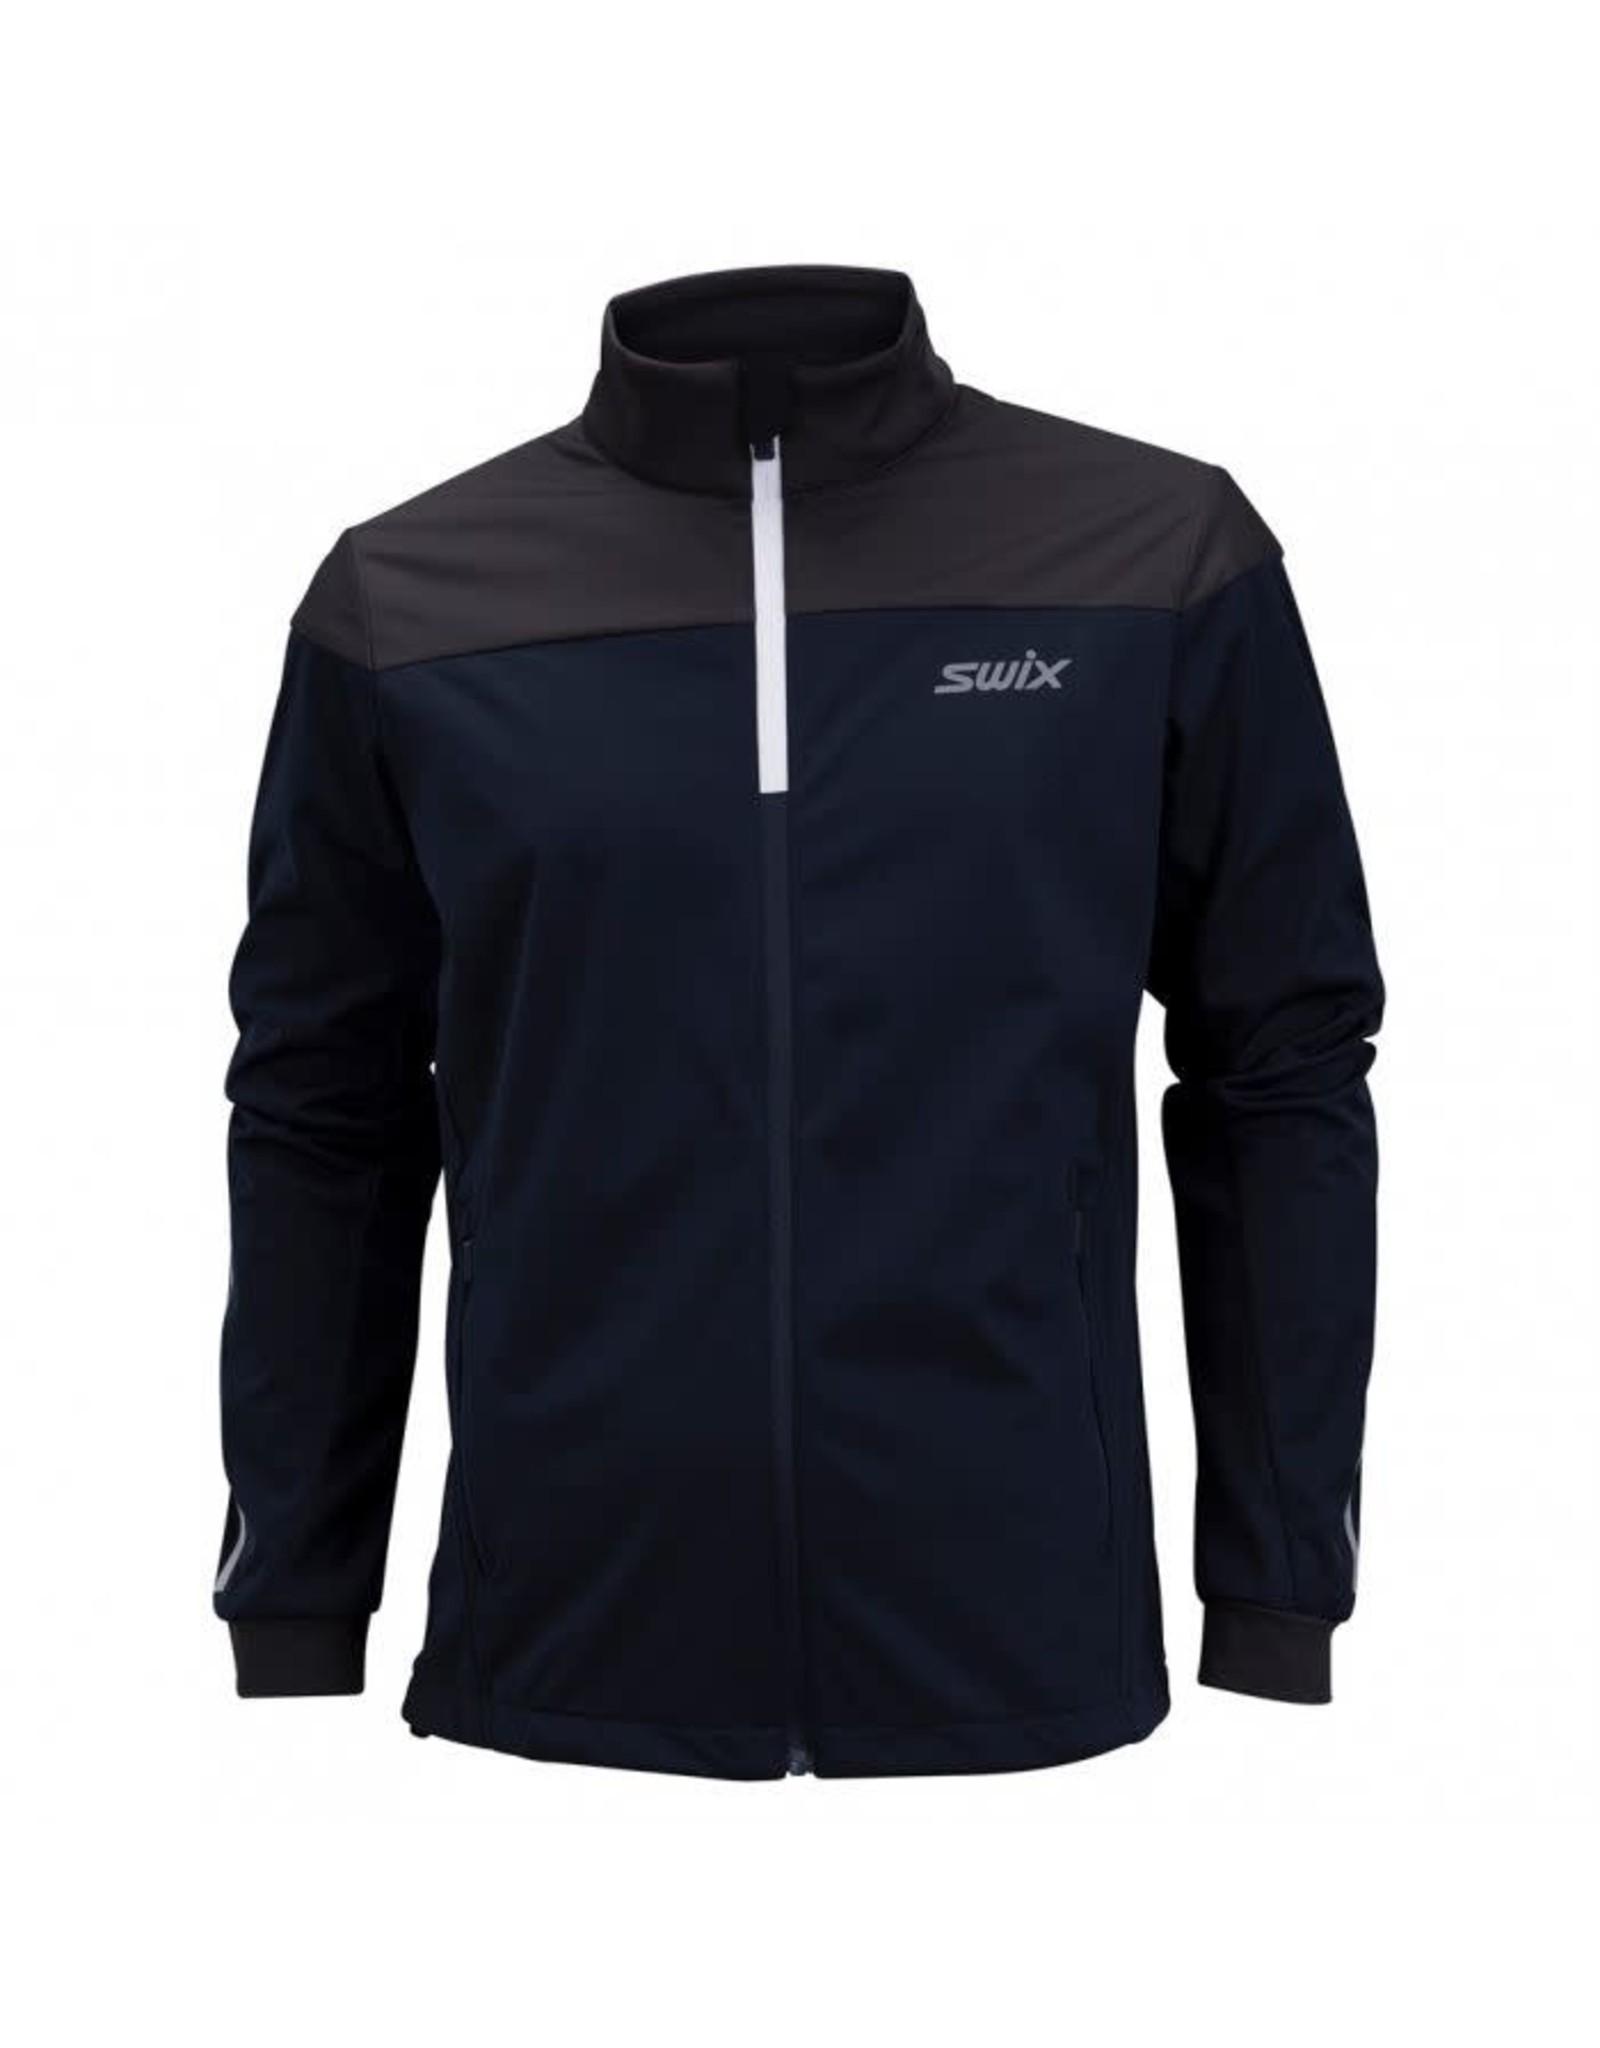 Swix '20 Swix, Crossjacket, Jacket, Mens